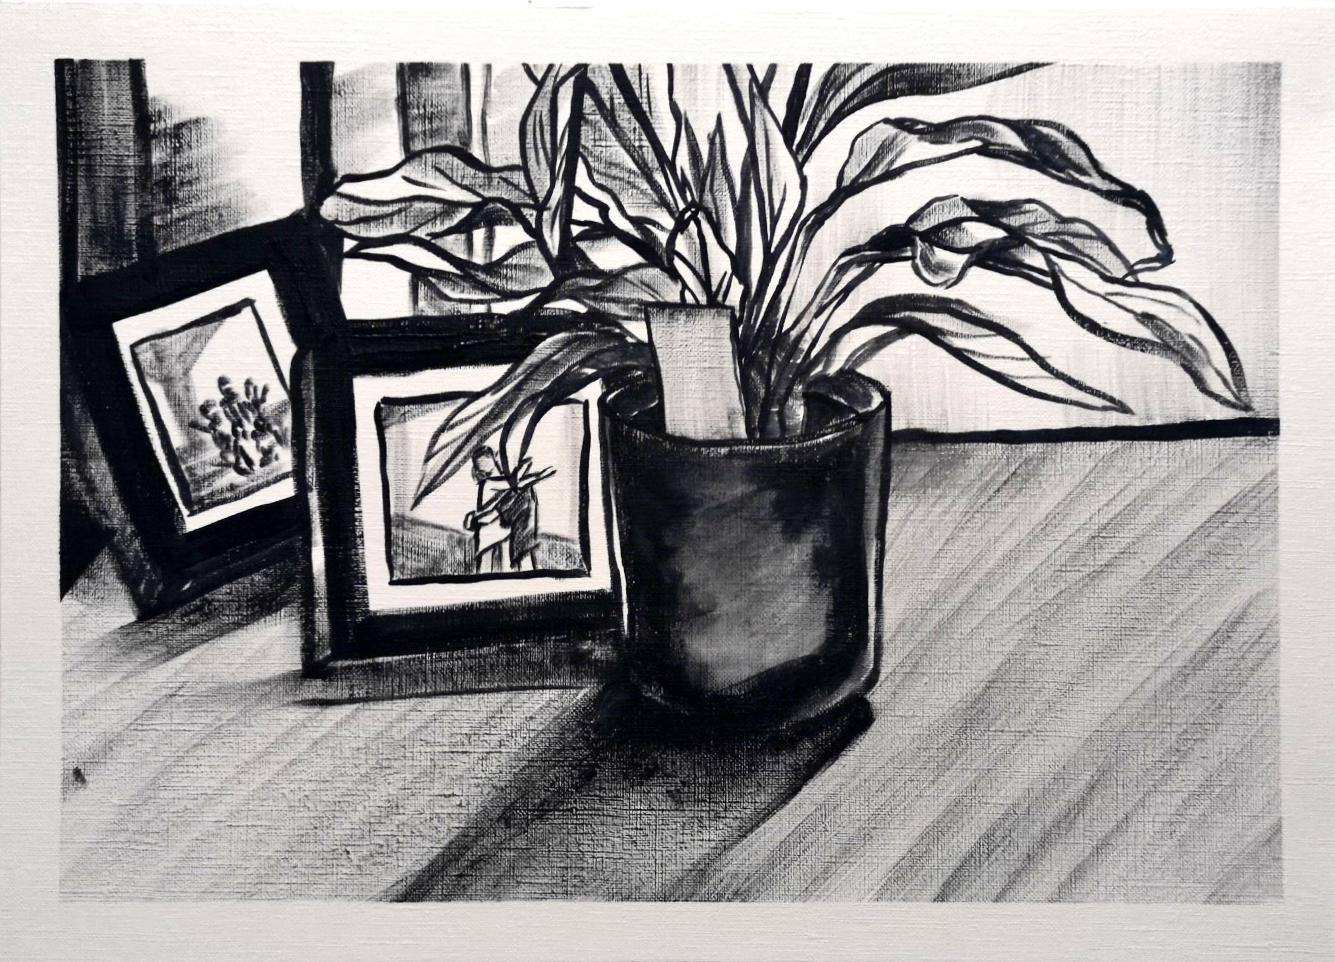 Black and White Study